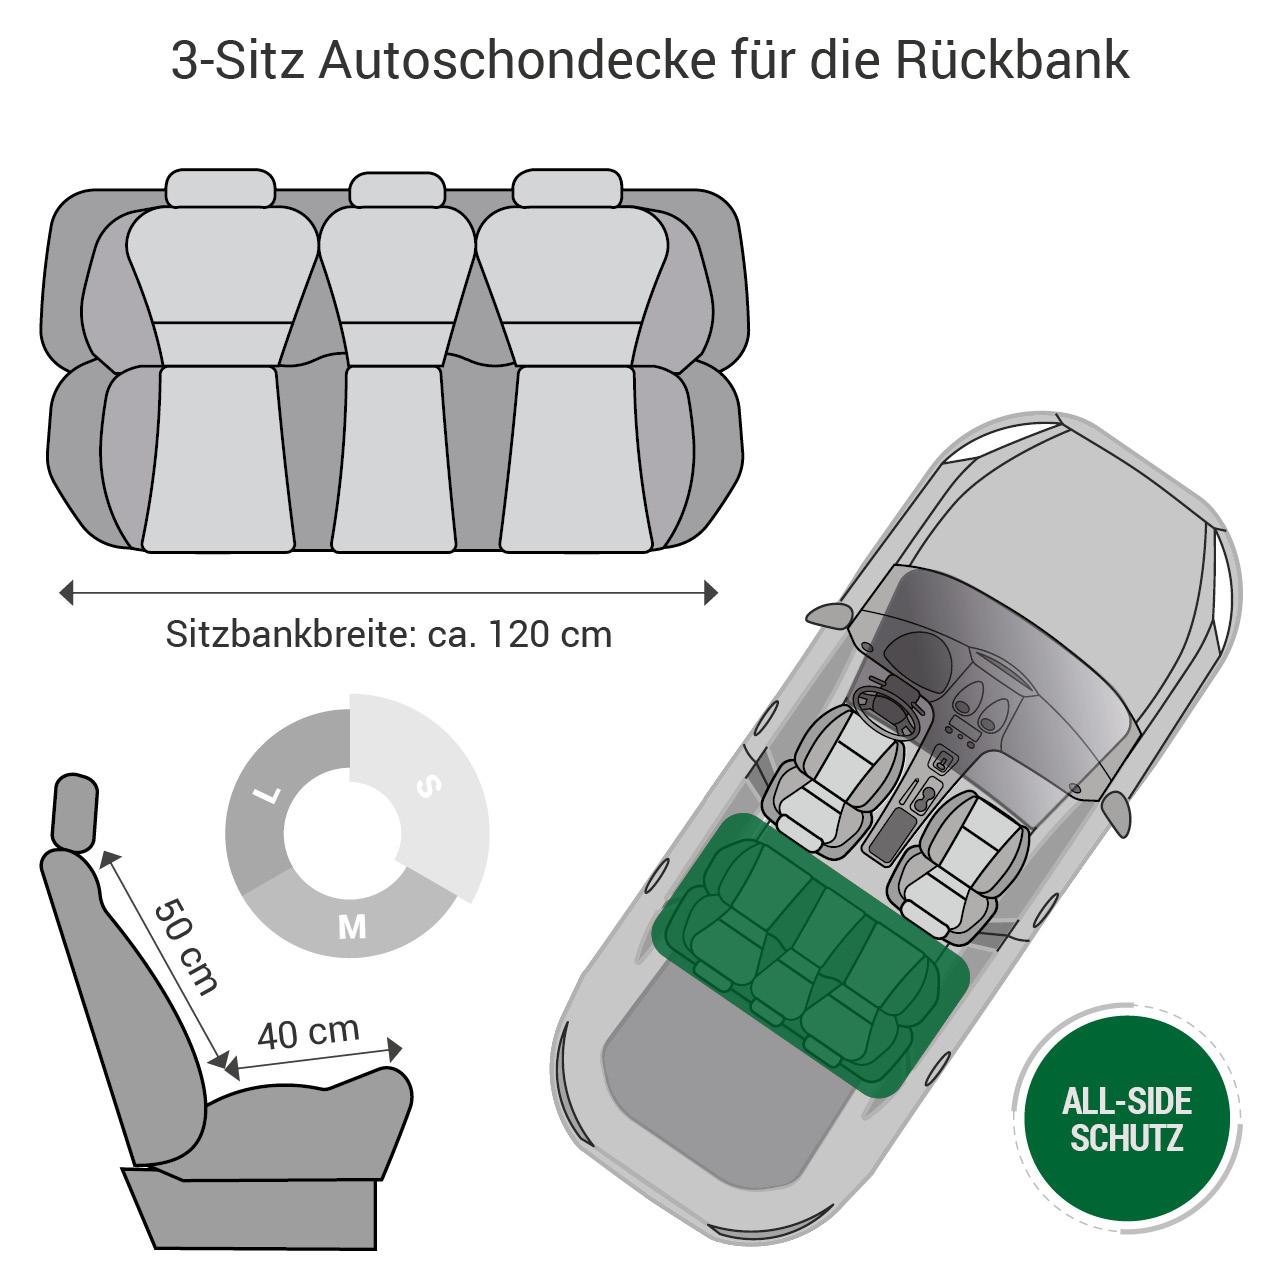 Doctor Bark - Autoschondecke für Hunde - Rückbank 3-Sitz Gr. S - grau